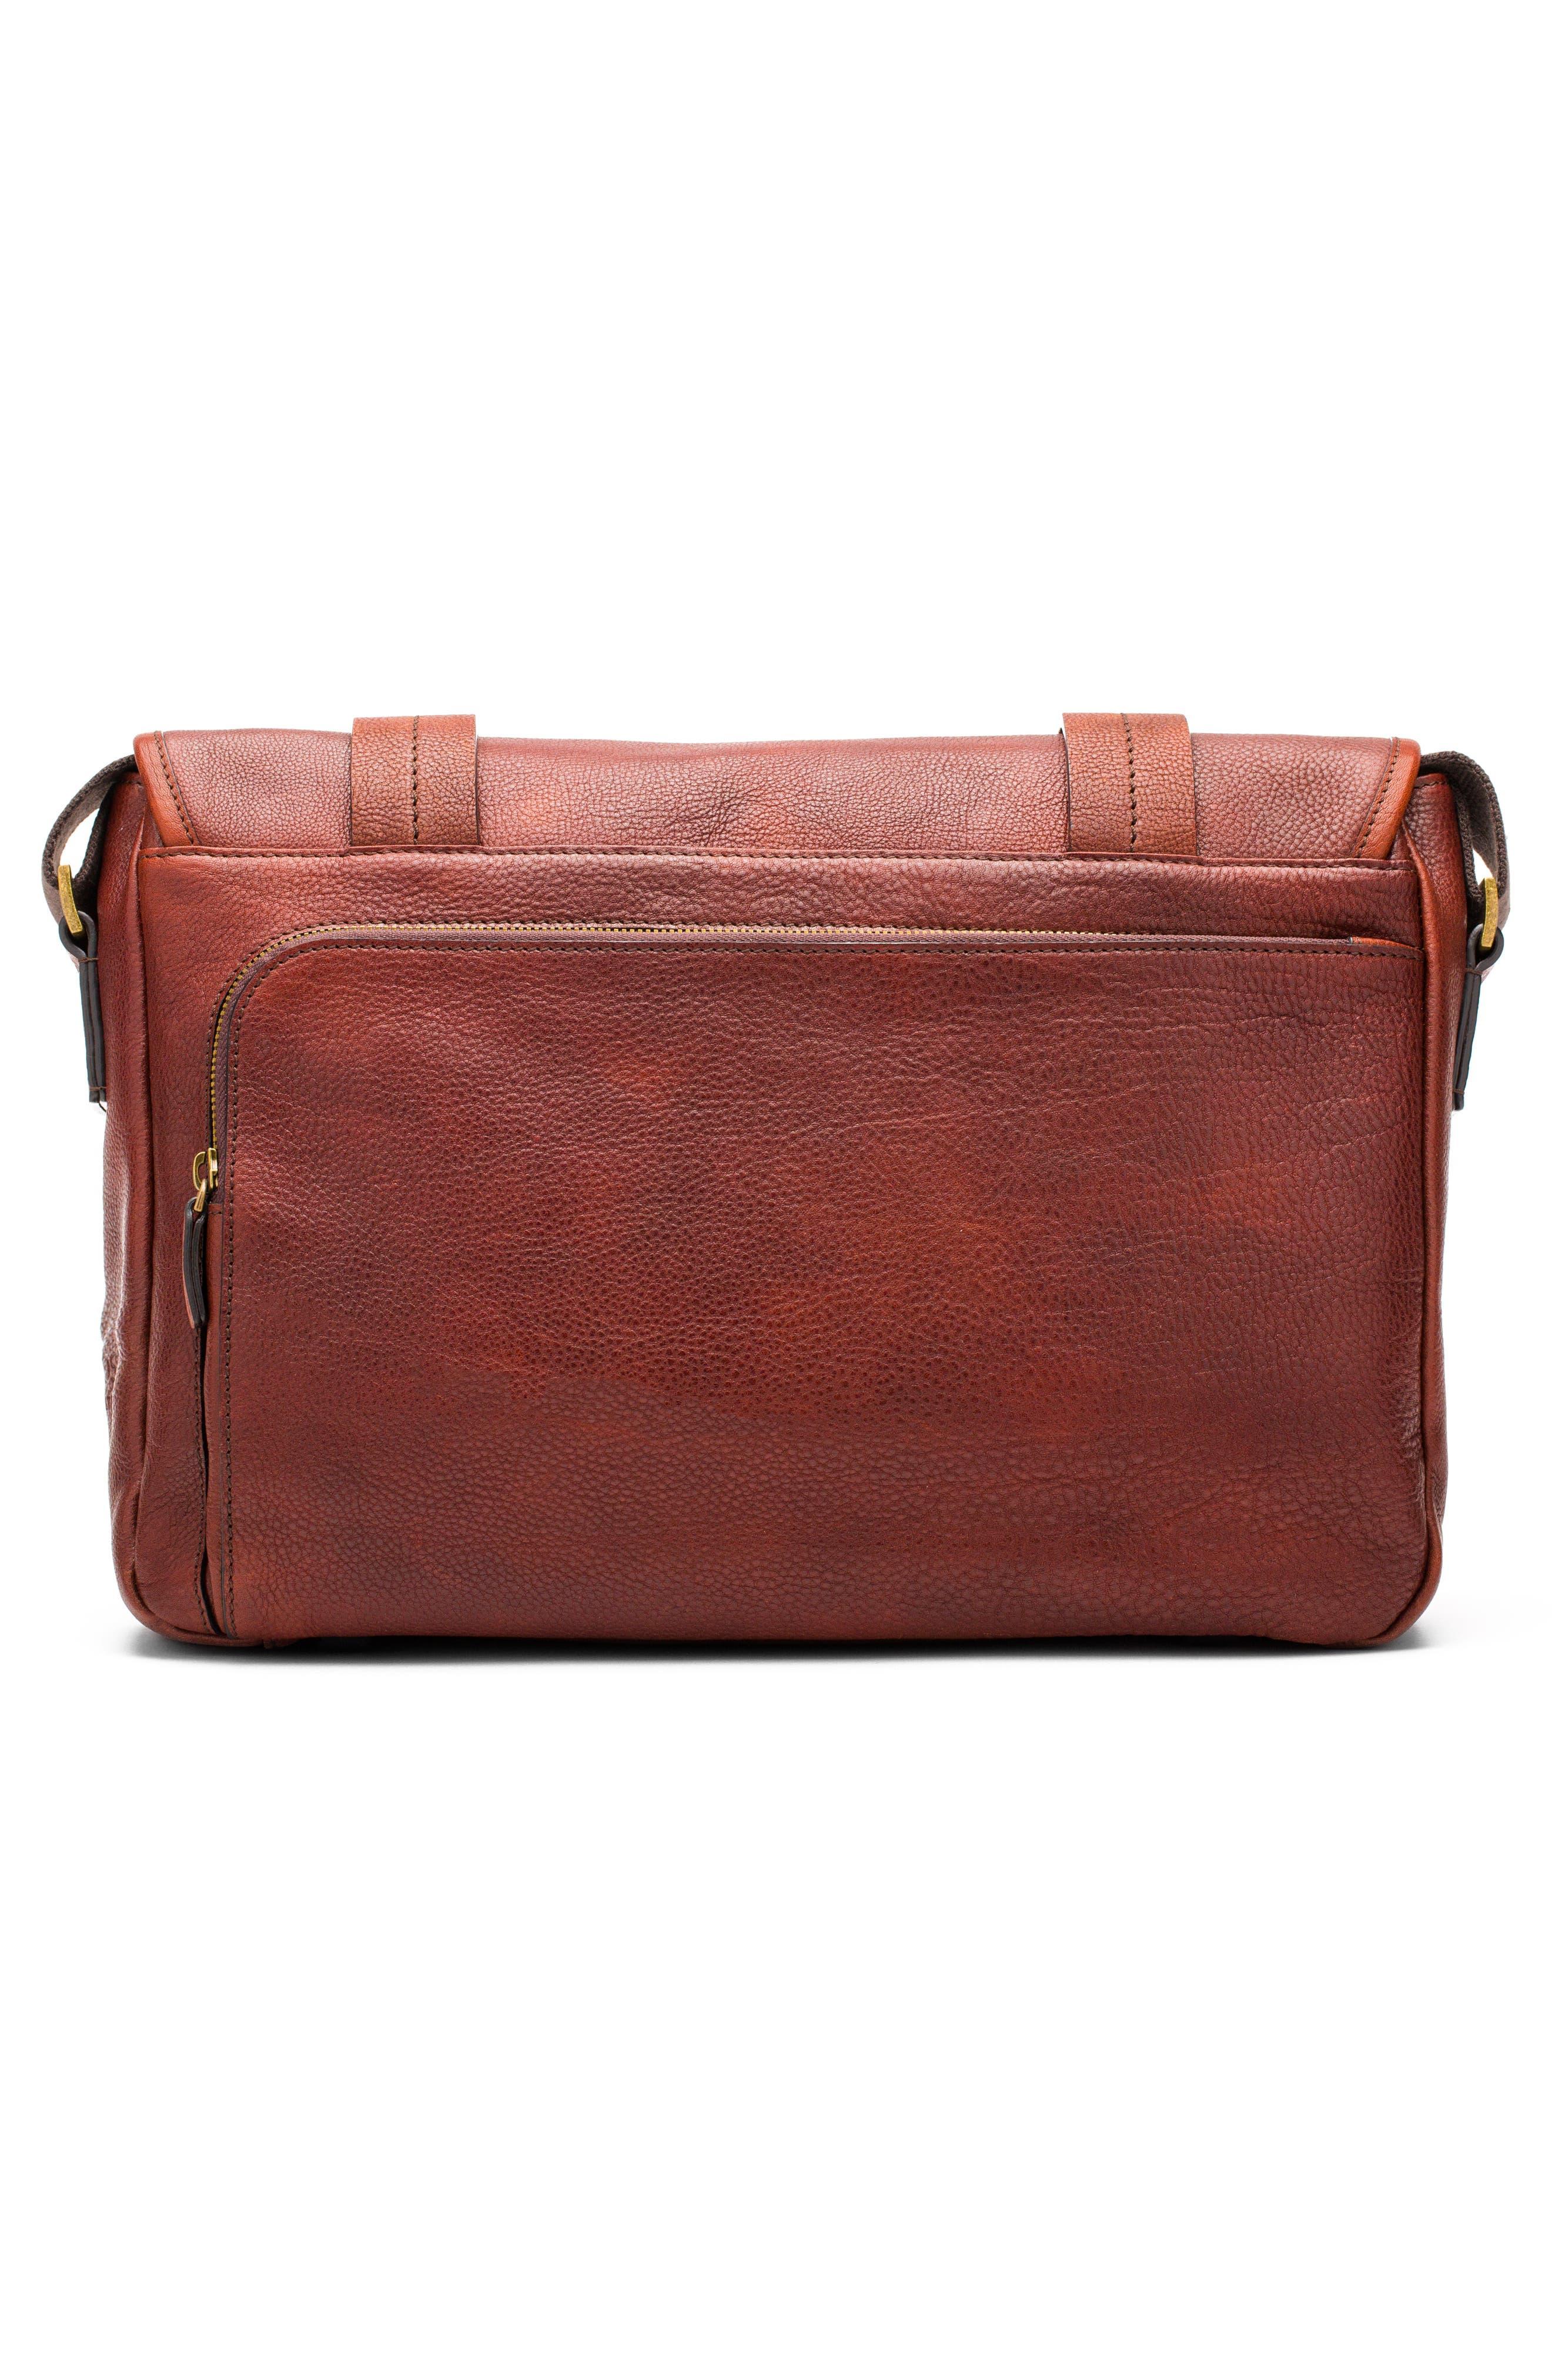 Leather Messenger Bag,                             Alternate thumbnail 2, color,                             DARK BROWN